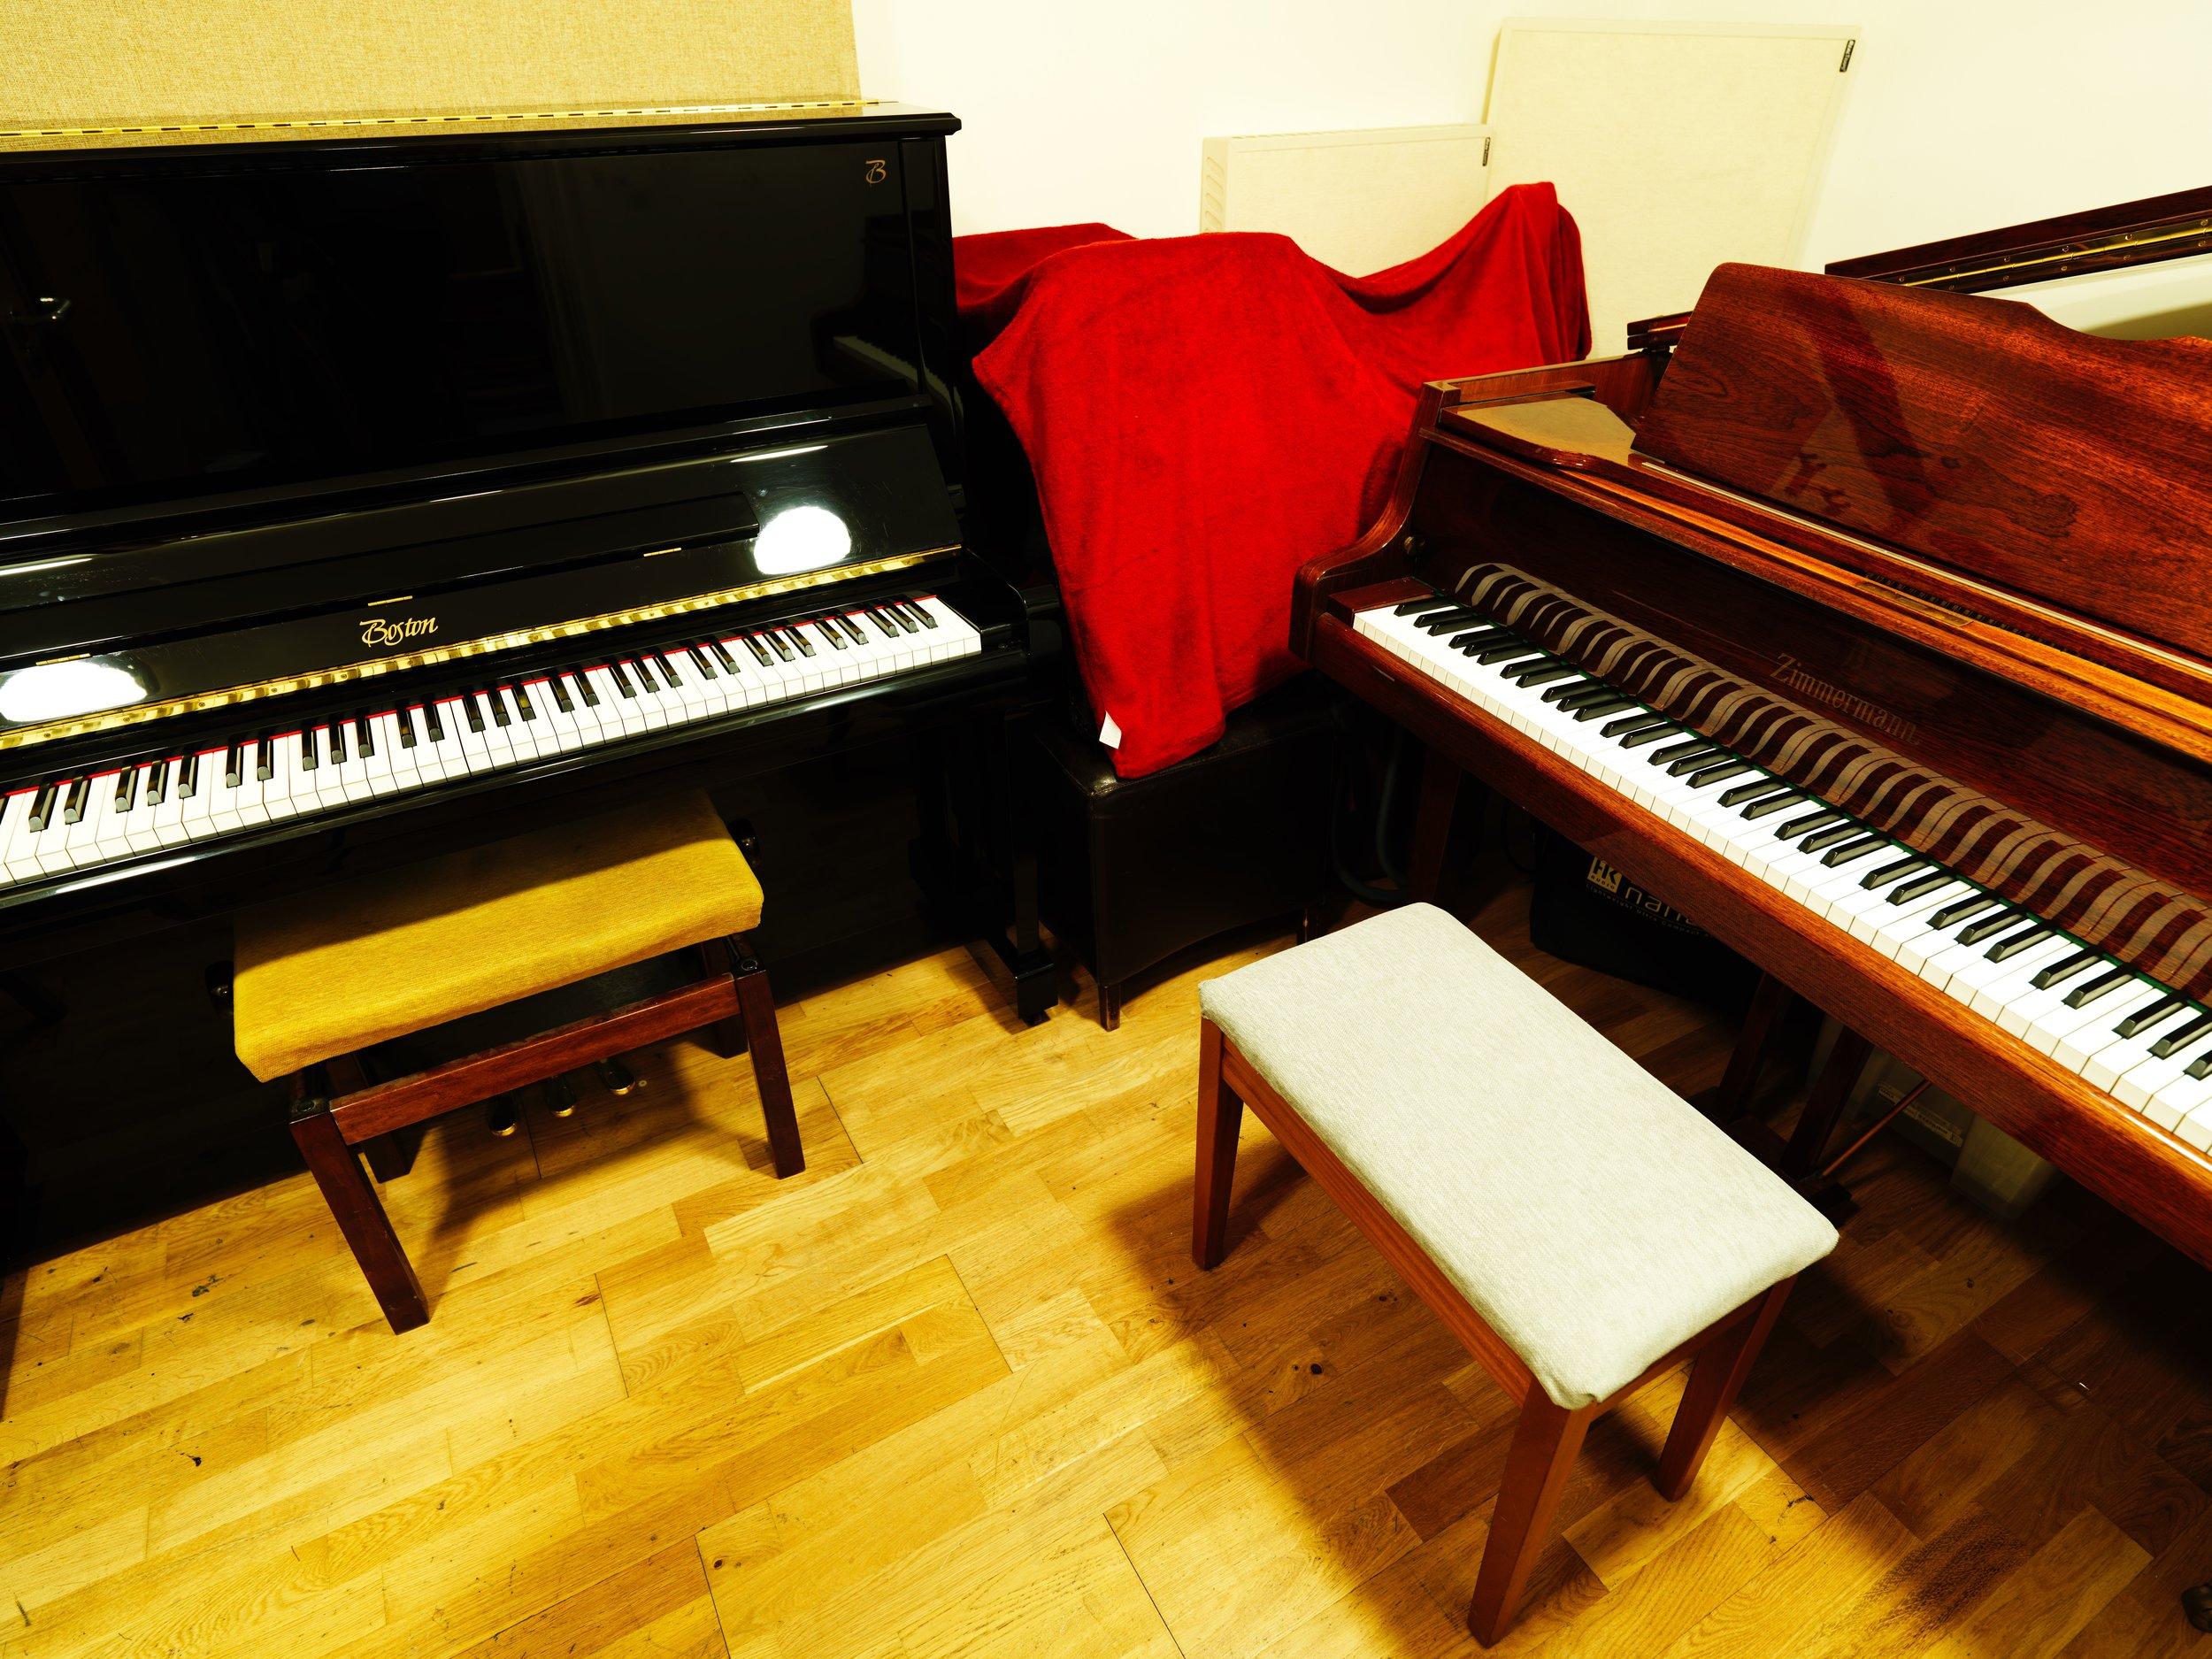 Renaissance Pianos - 4 Studios